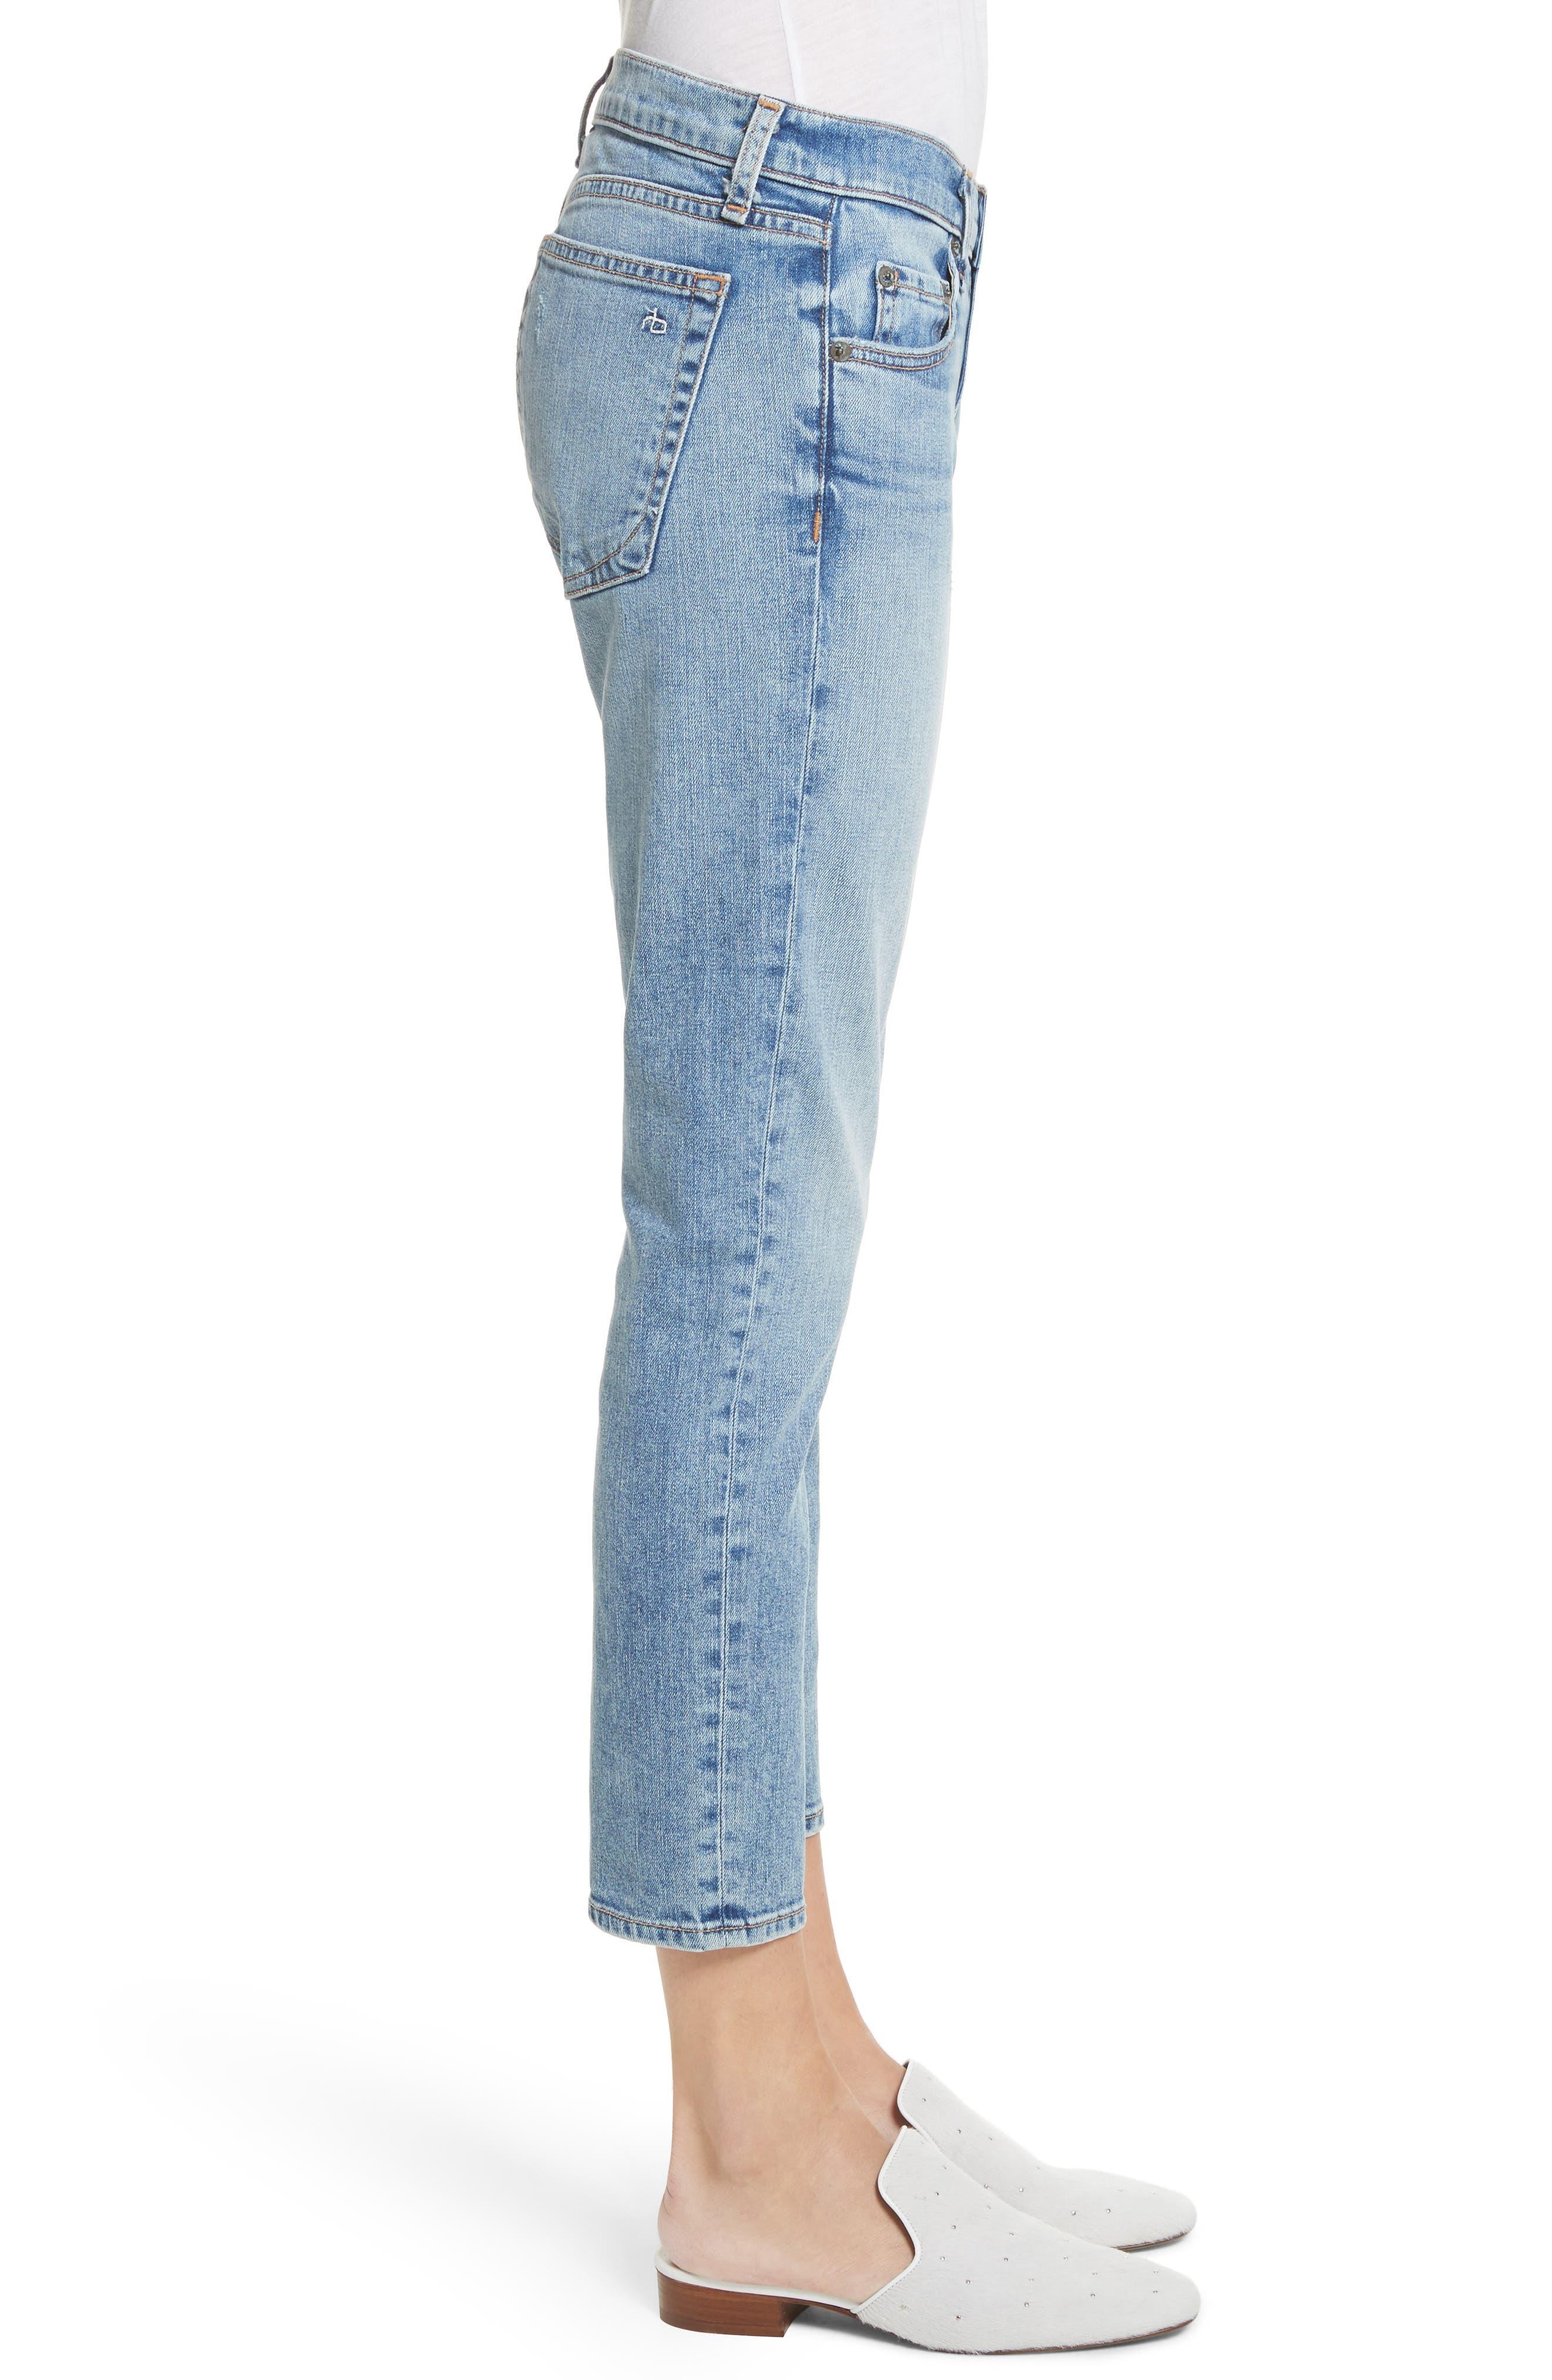 Alternate Image 3  - rag & bone/JEAN The Dre Ankle Slim Boyfriend Jeans (Alphaville)